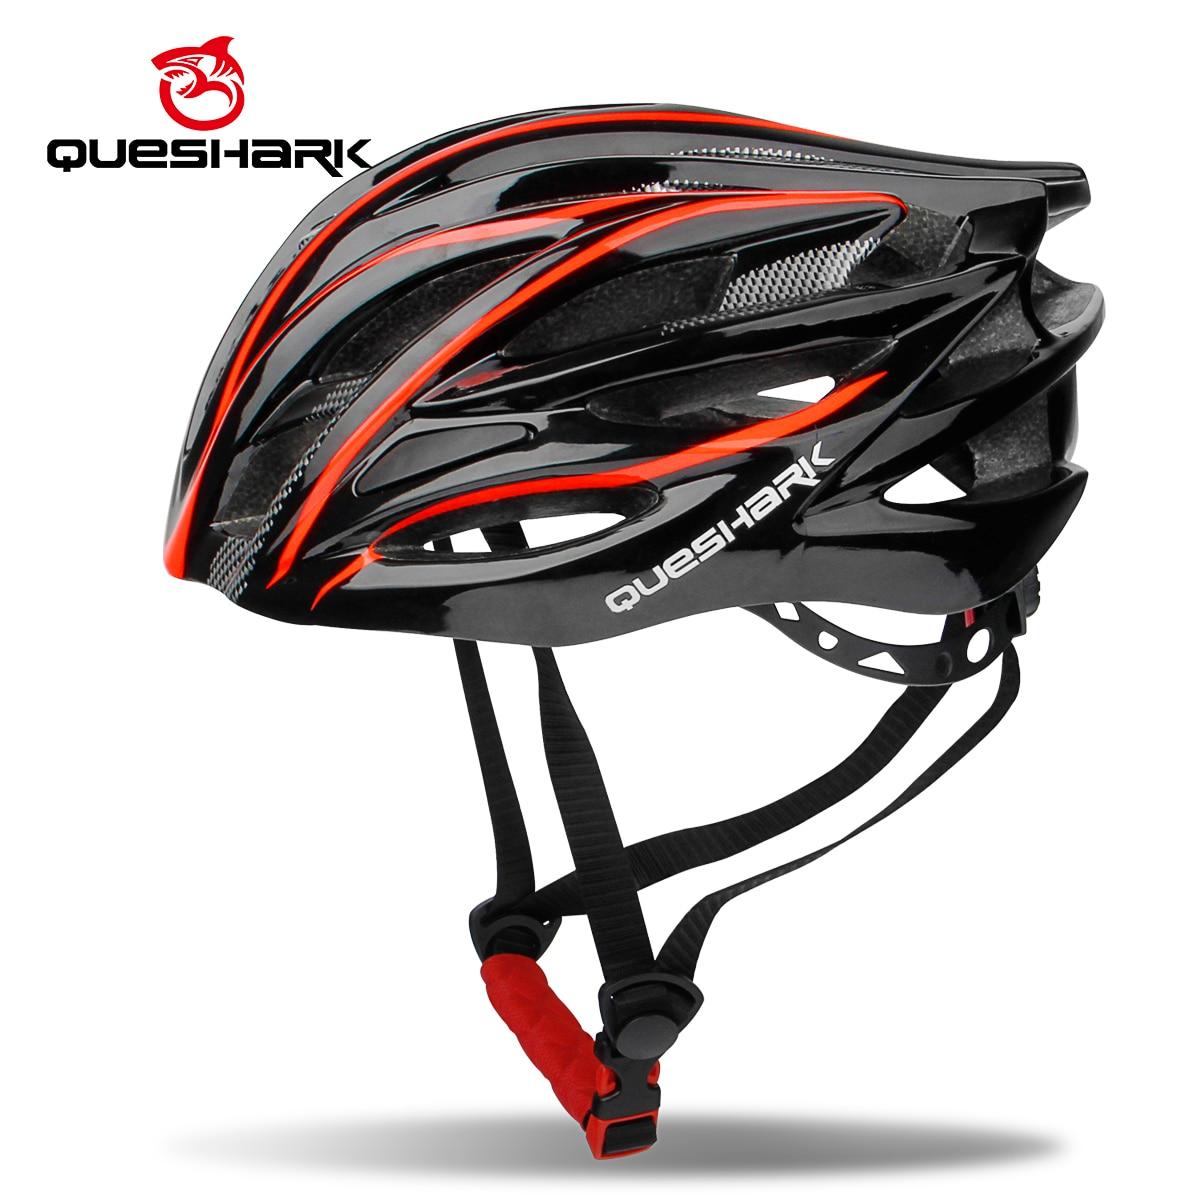 QUESHARK Bicycle Helmet Mountain-Road-Bike Air-Vents Ultralight Women Head-Safety Riding